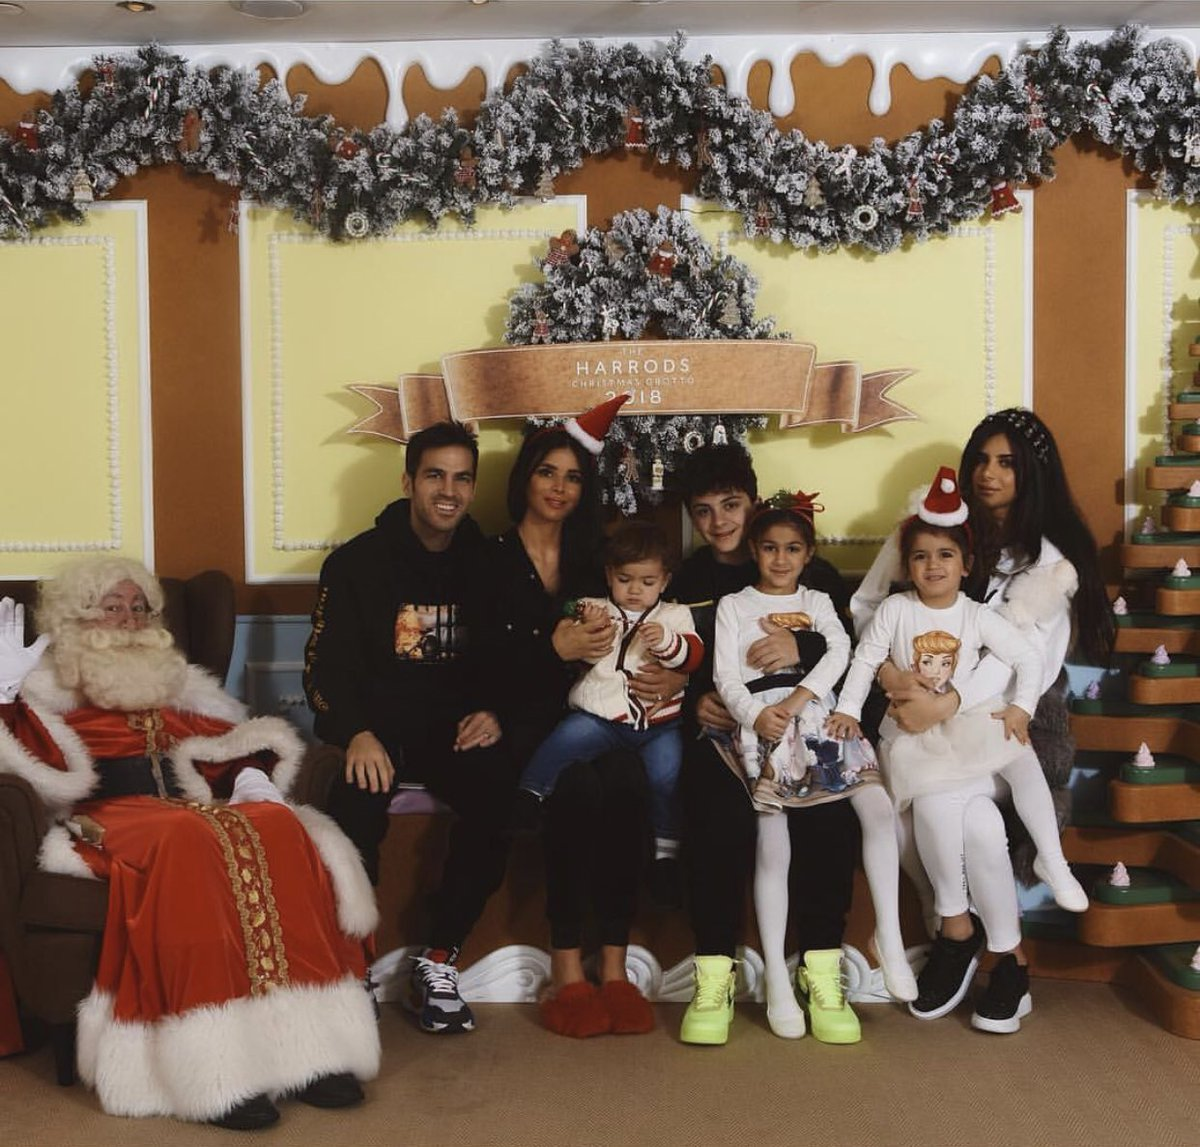 Morning visit to Santa's house 🎅 🙏🏻❤️